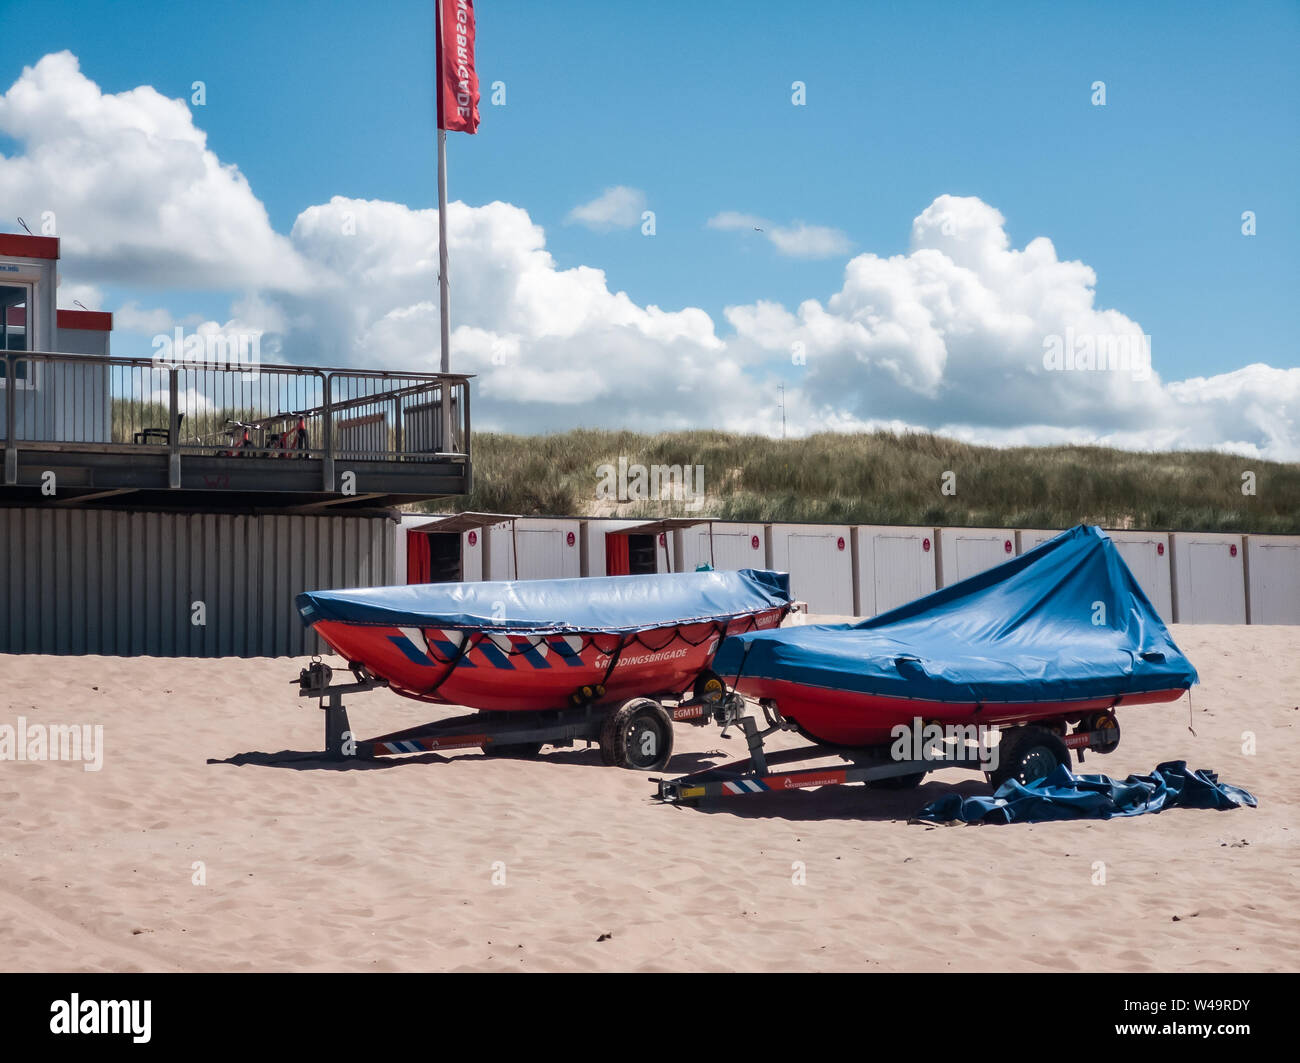 Egmond aan Zee, Netherlands - July 21, 2019: lifesaving ships of the dutch coastguard on the beach Stock Photo